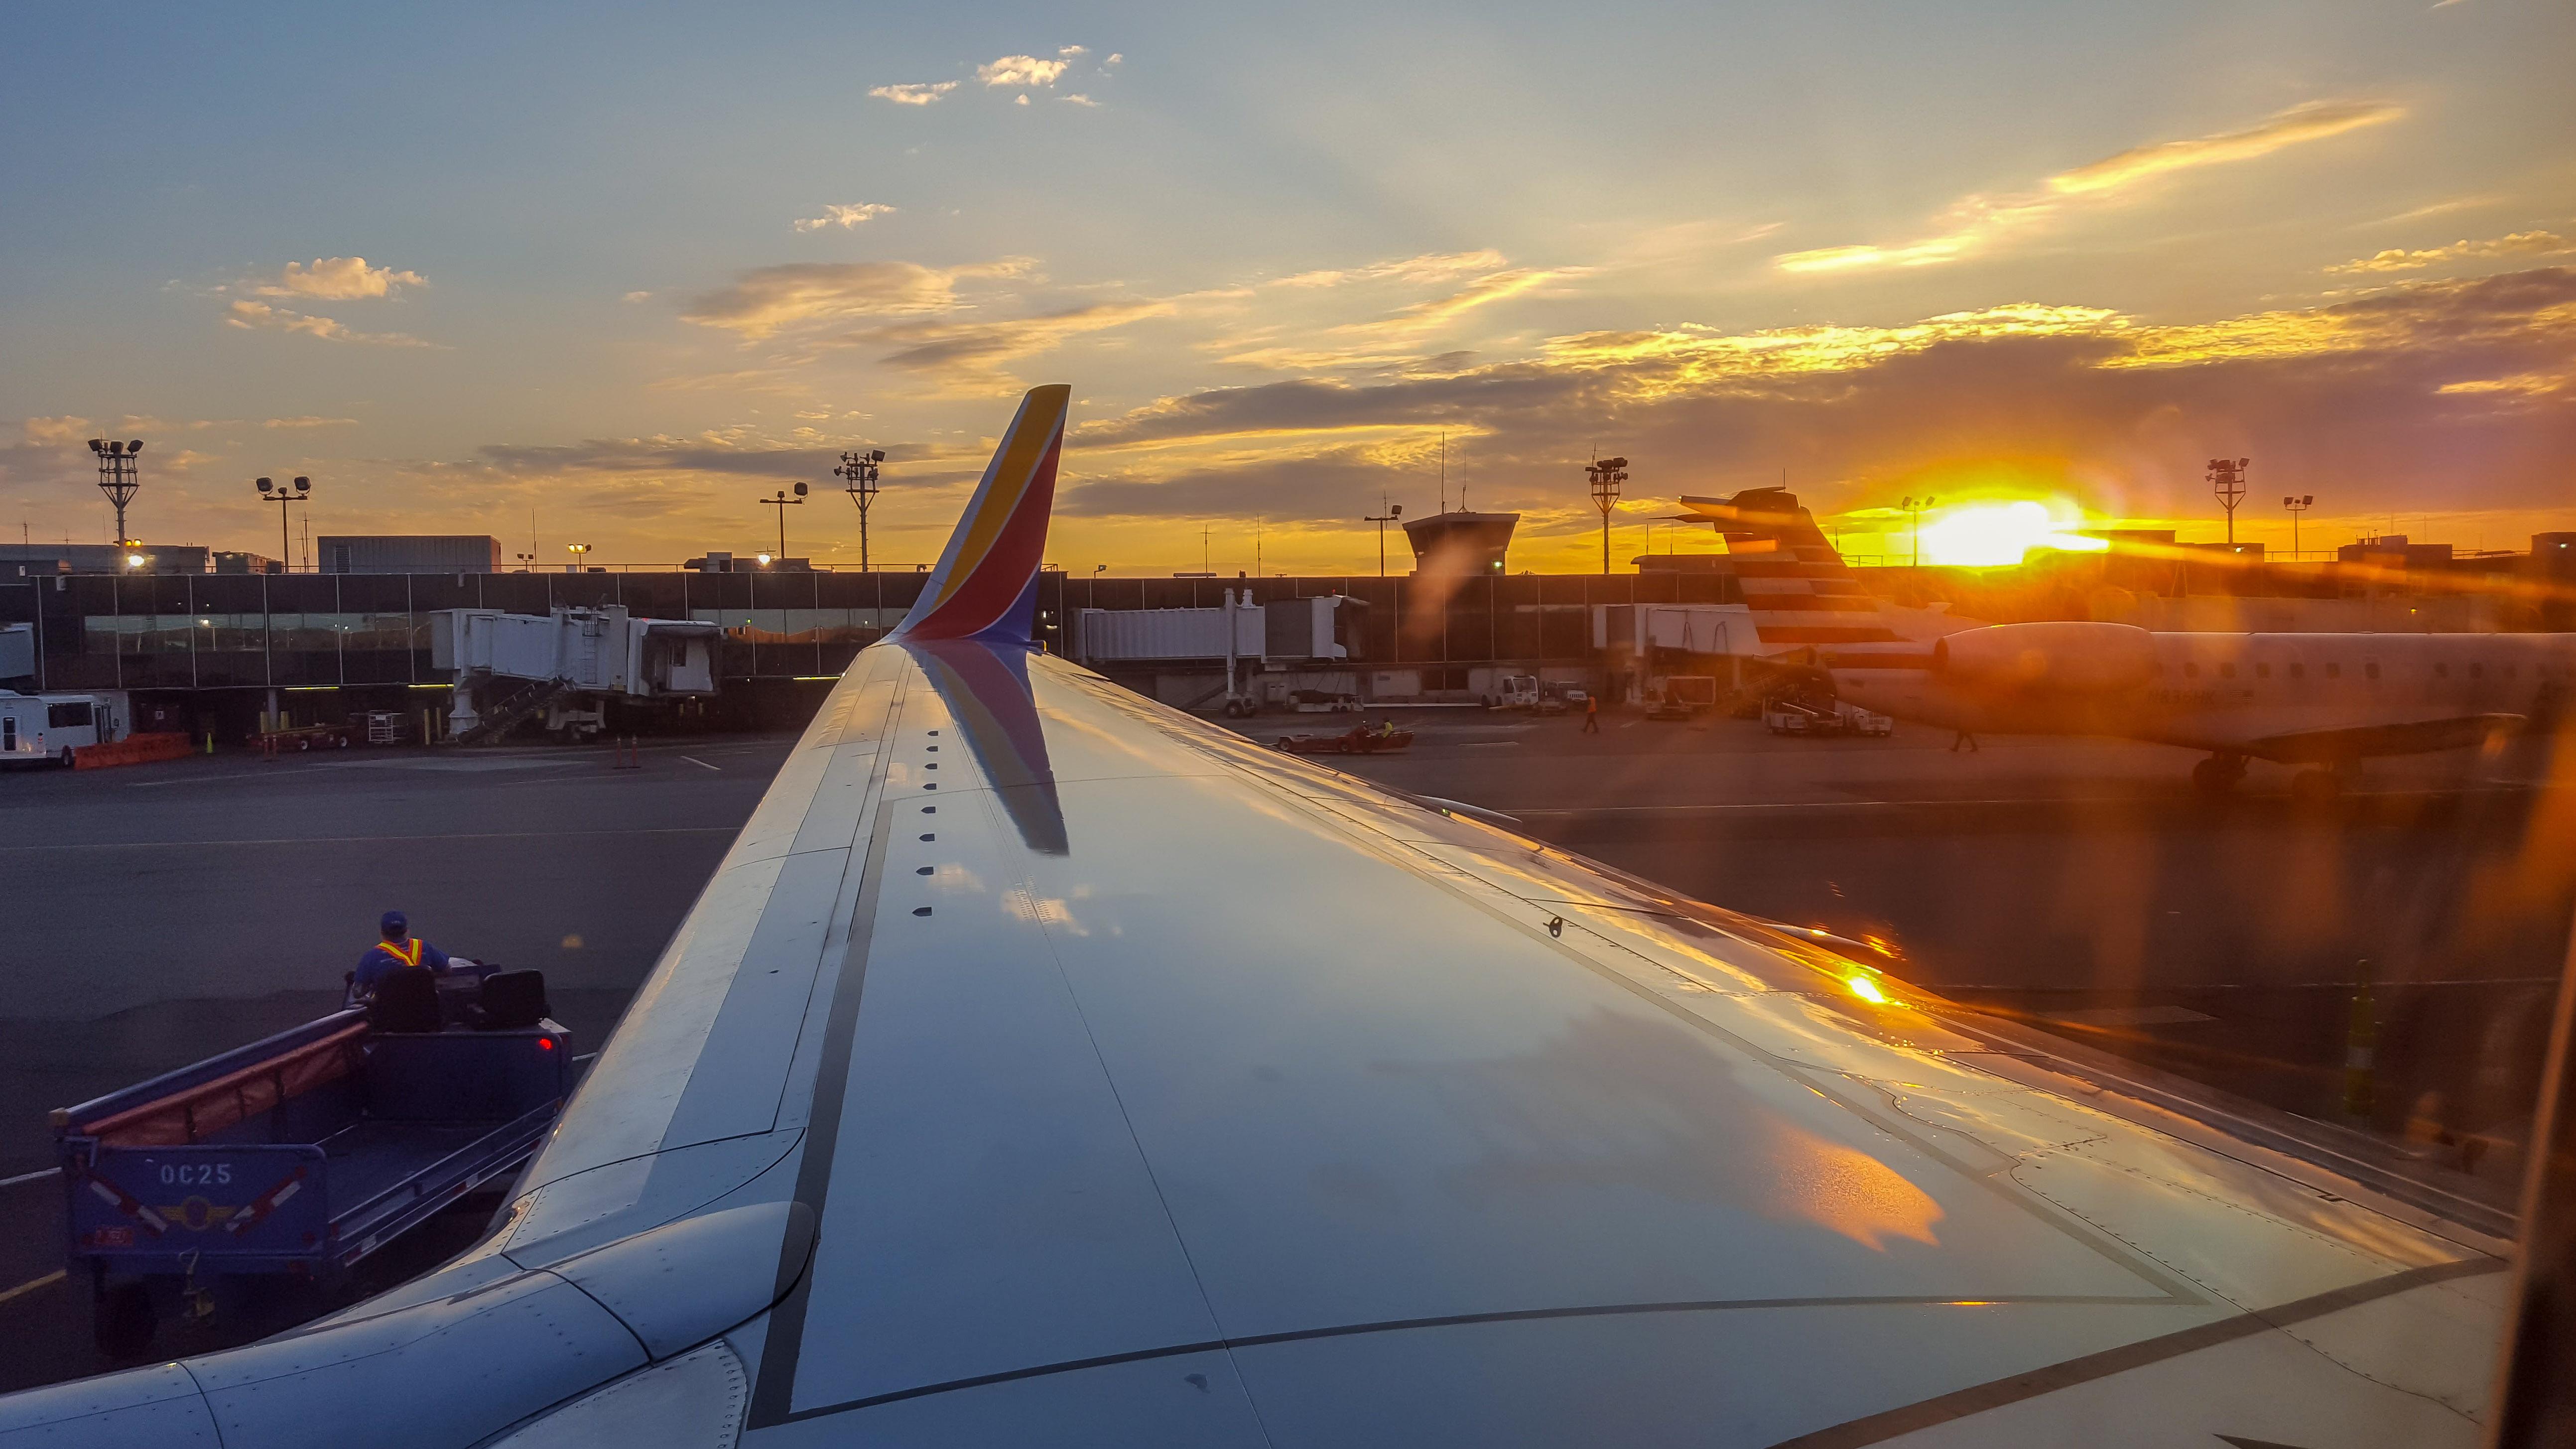 Aeroporto York : Papel de parede : pôr do sol céu nova york sudoeste cor